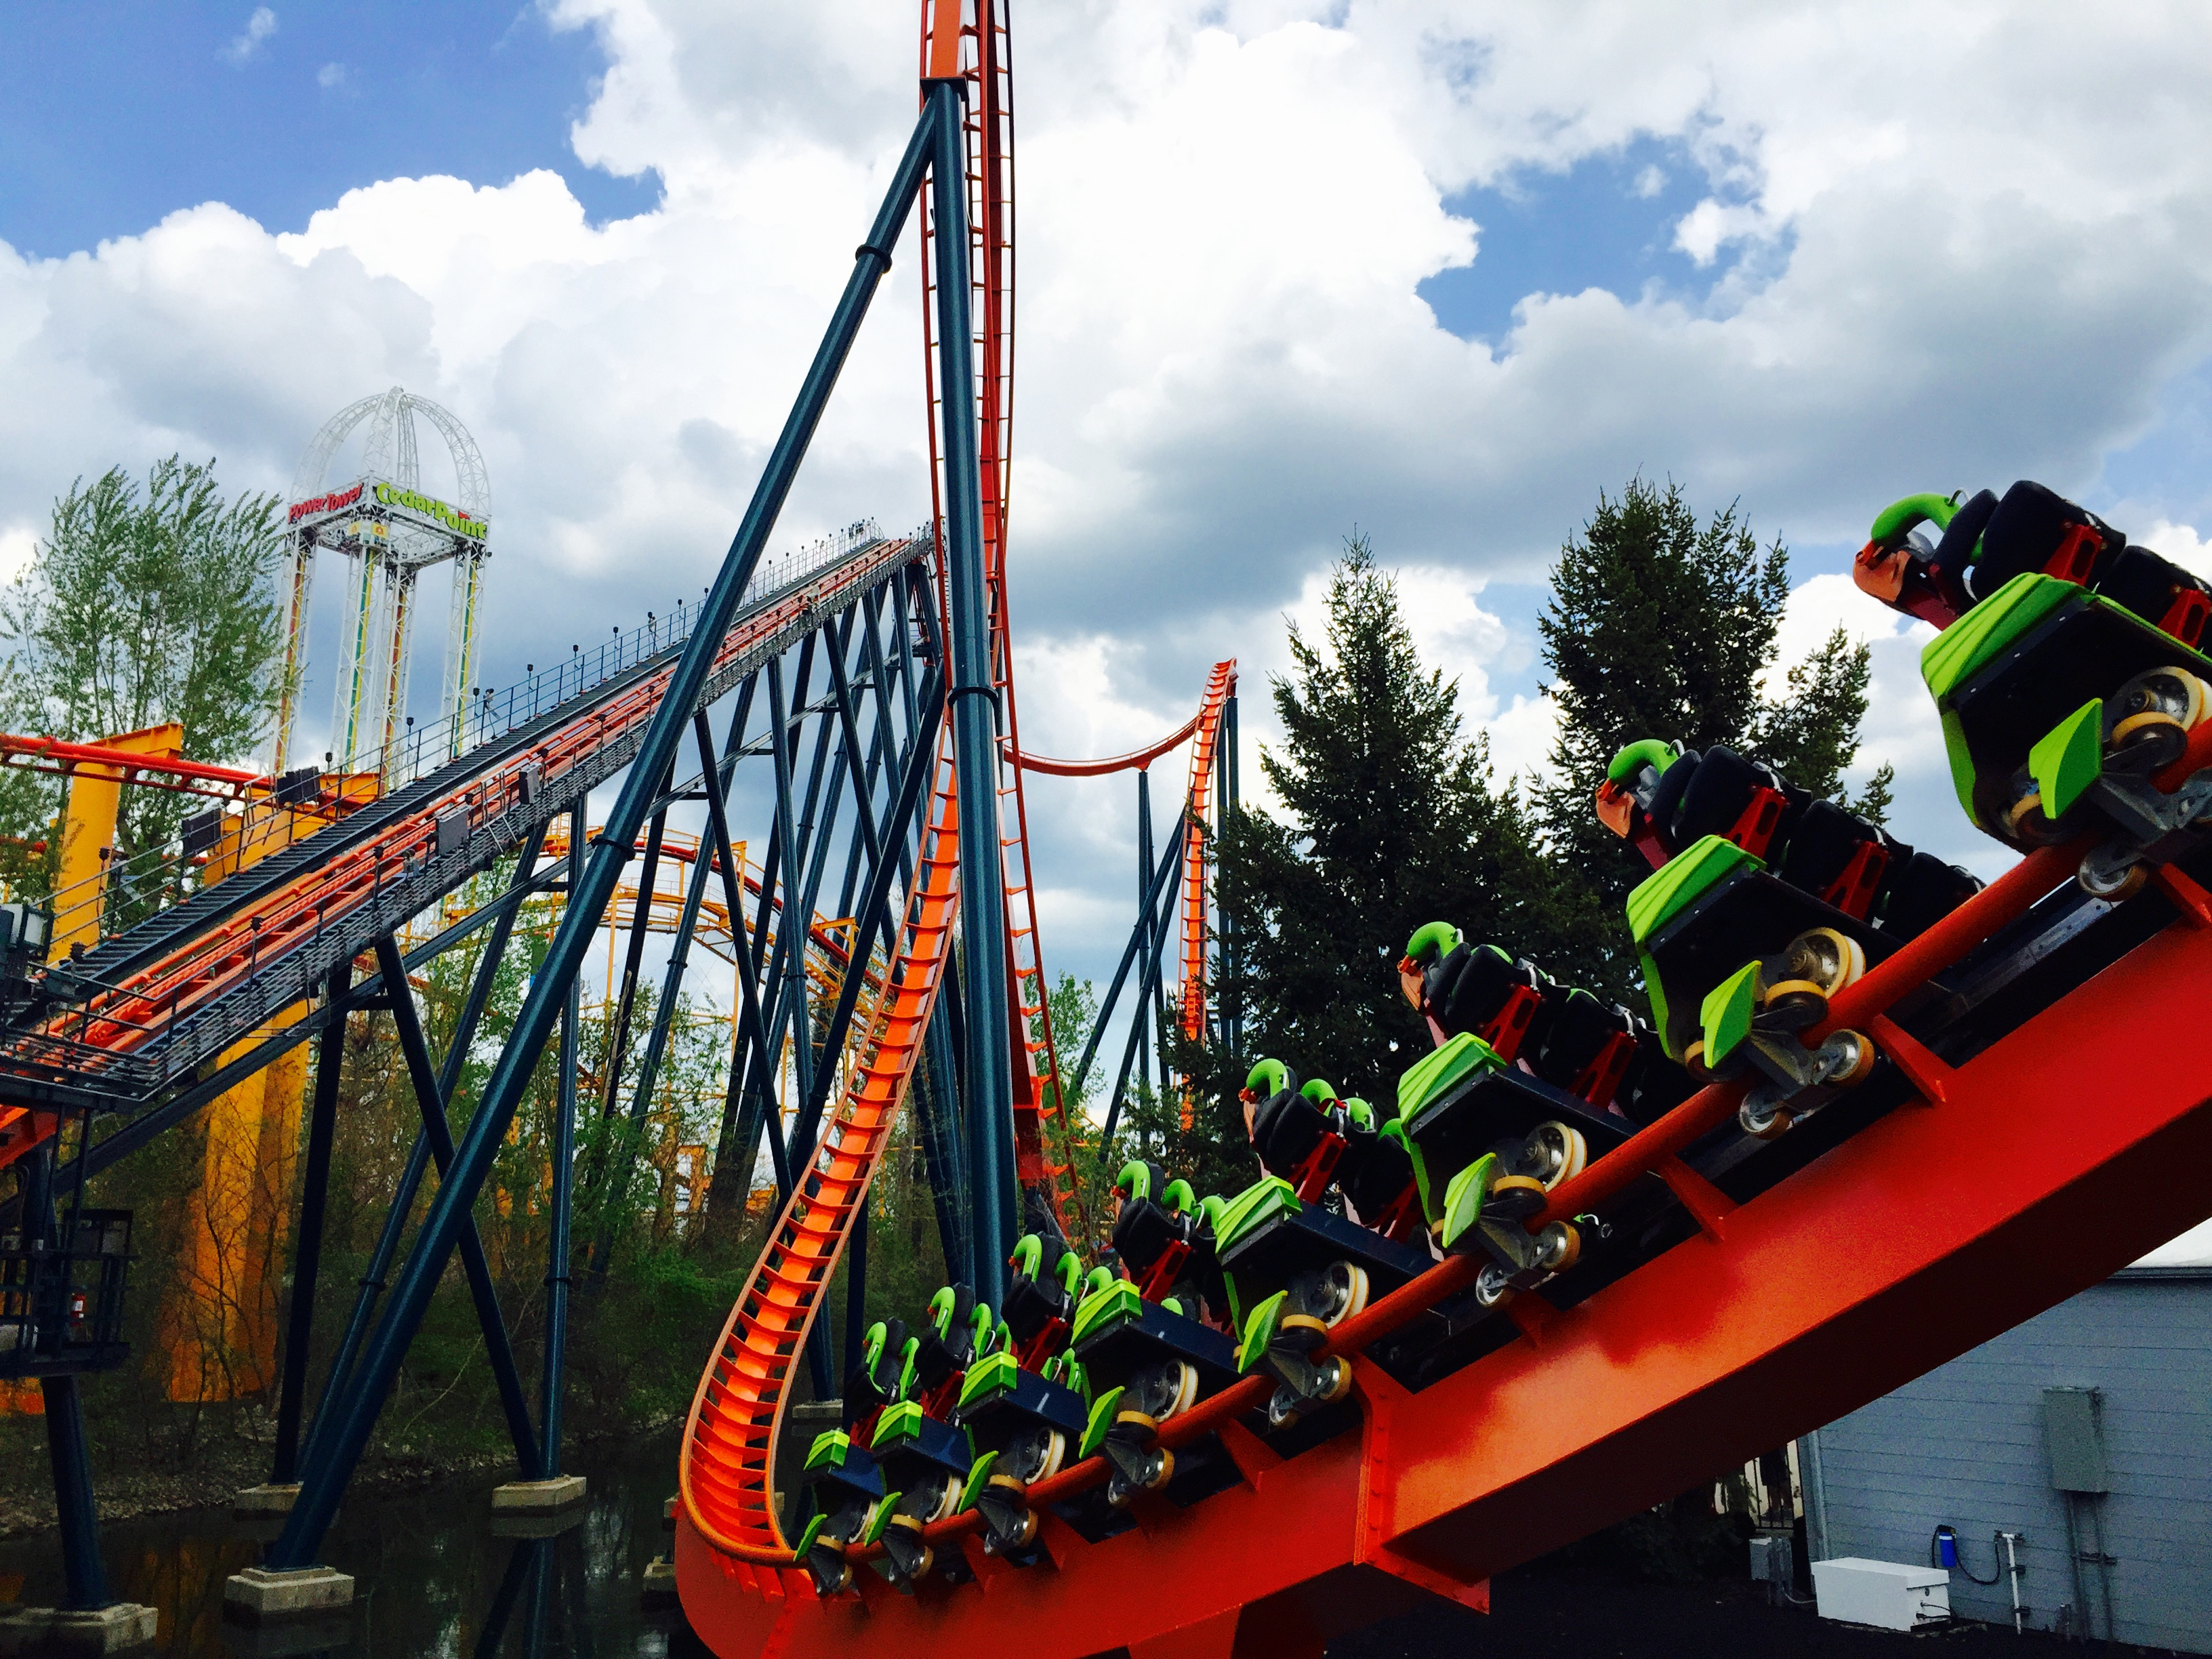 Cedar_Point_Rougarou_cars_on_loop_track_%282859%29 rougarou (roller coaster) wikipedia